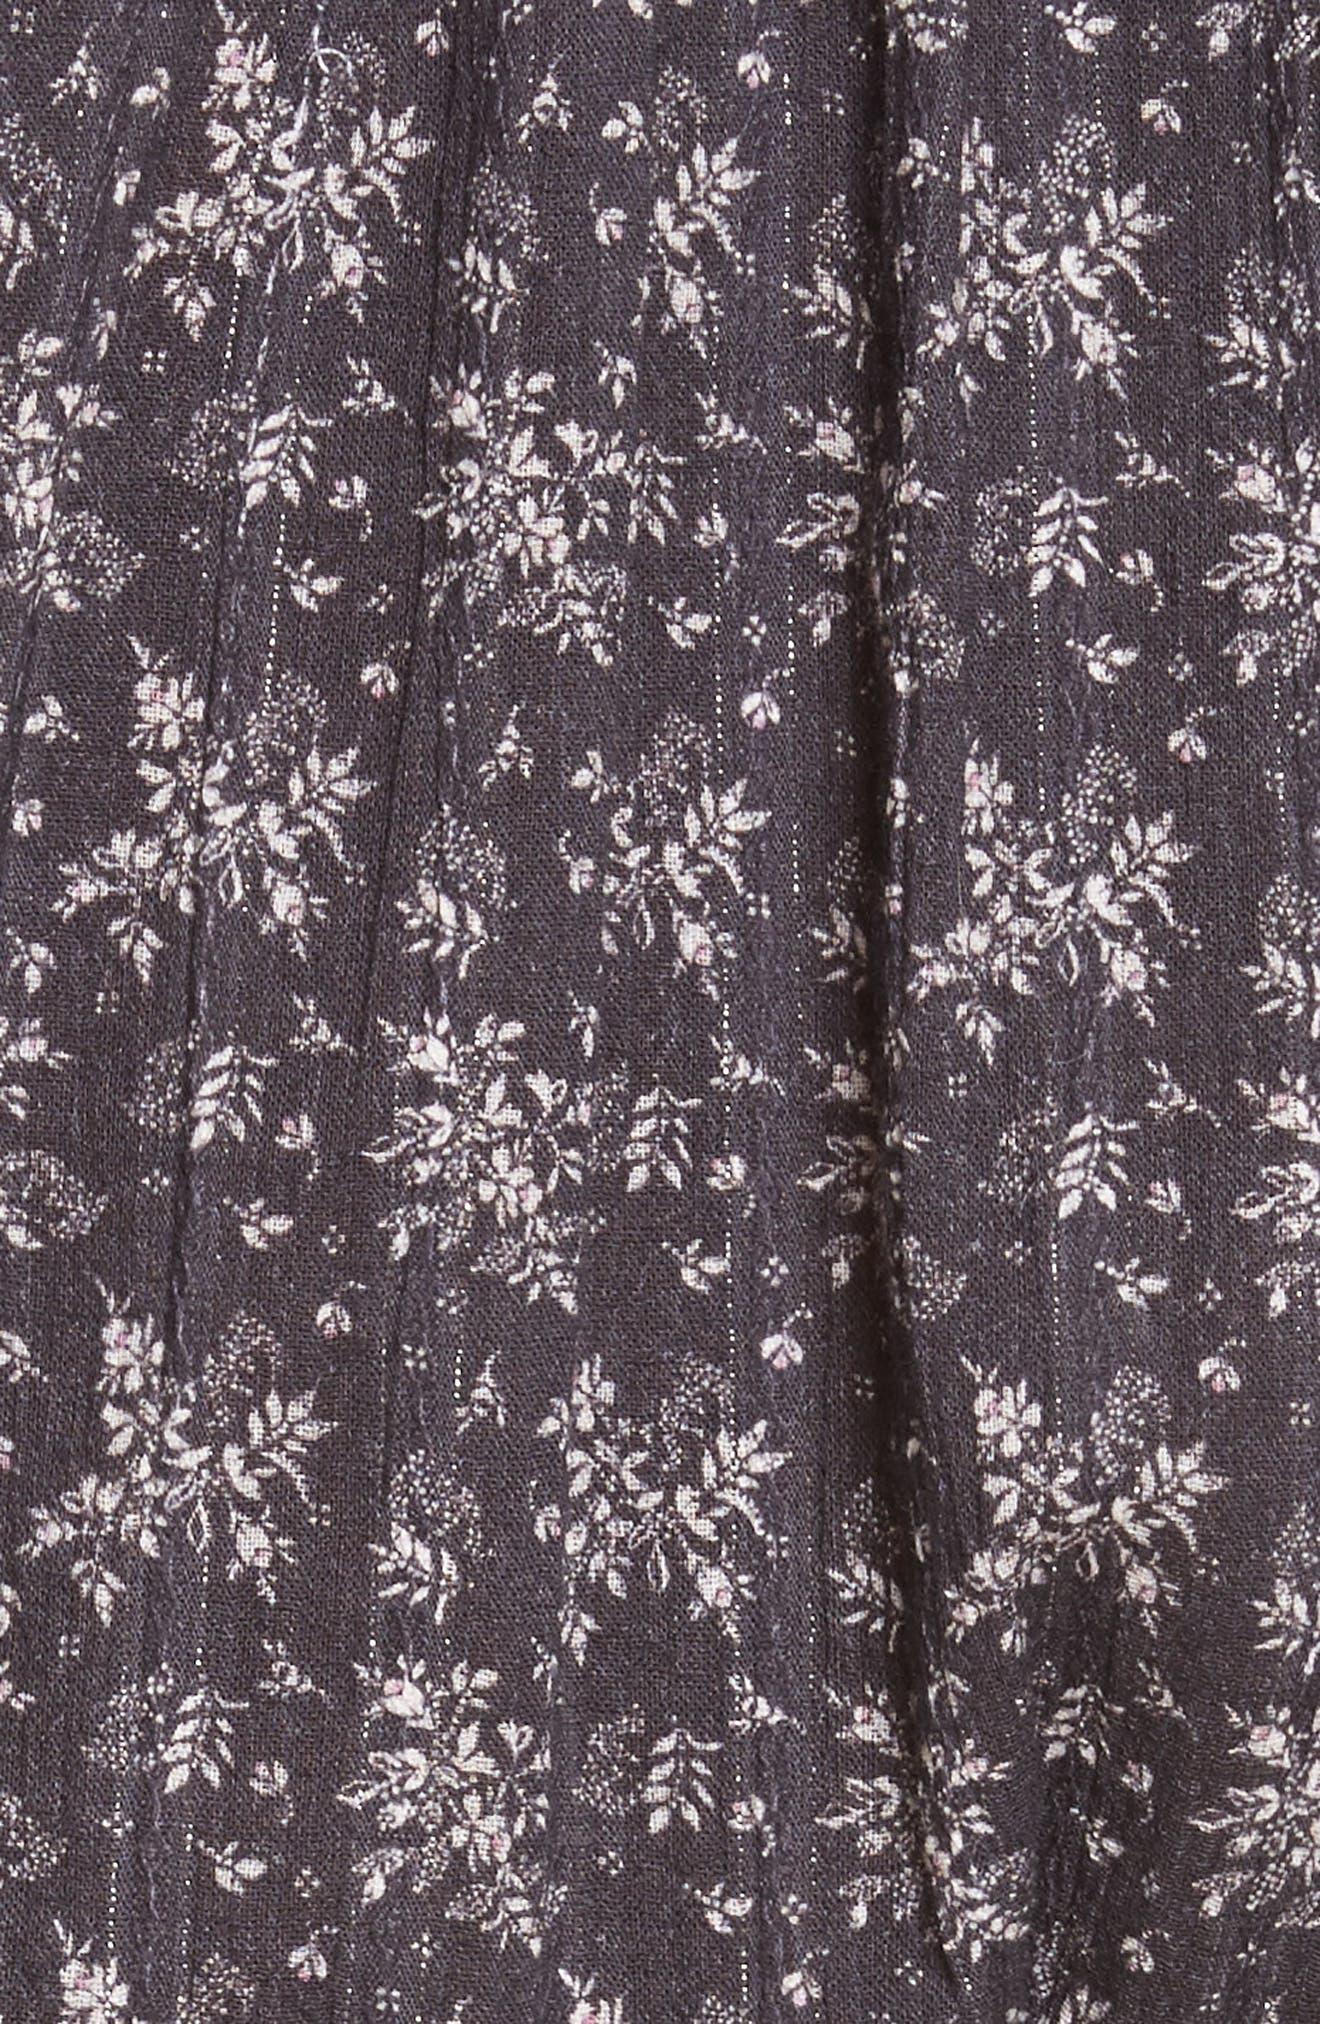 Angelique Long Sleeve Dress,                             Alternate thumbnail 5, color,                             Black Combo